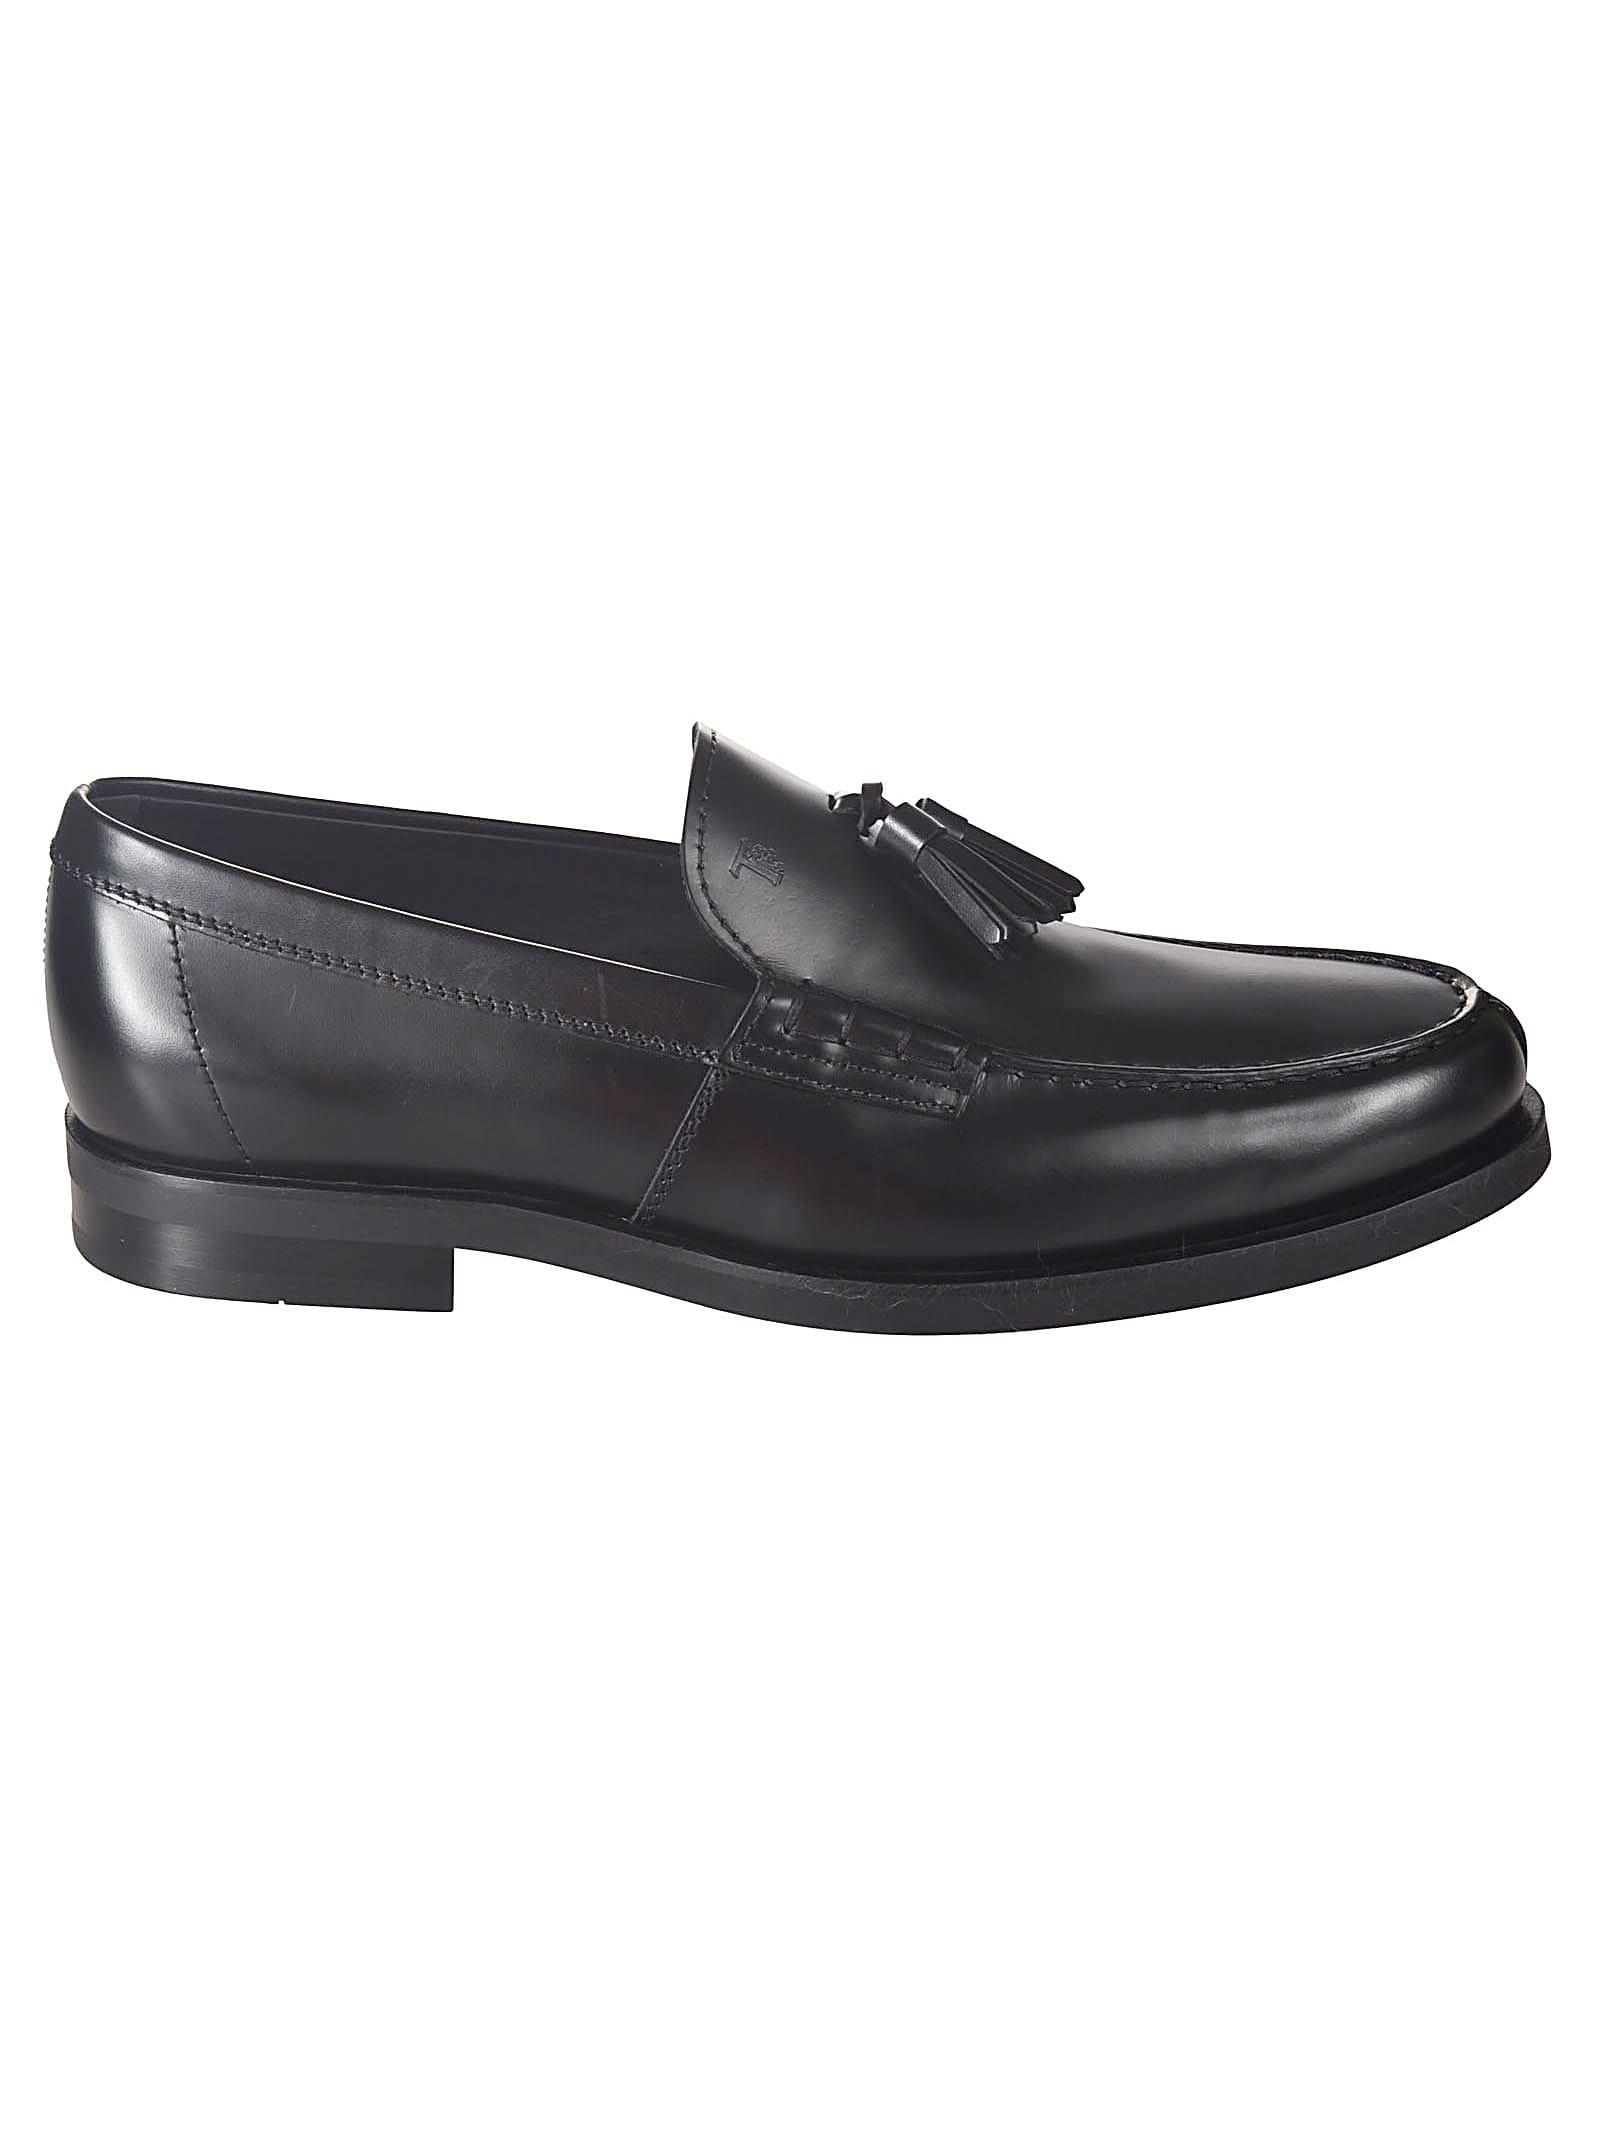 Tassel Applique Loafers